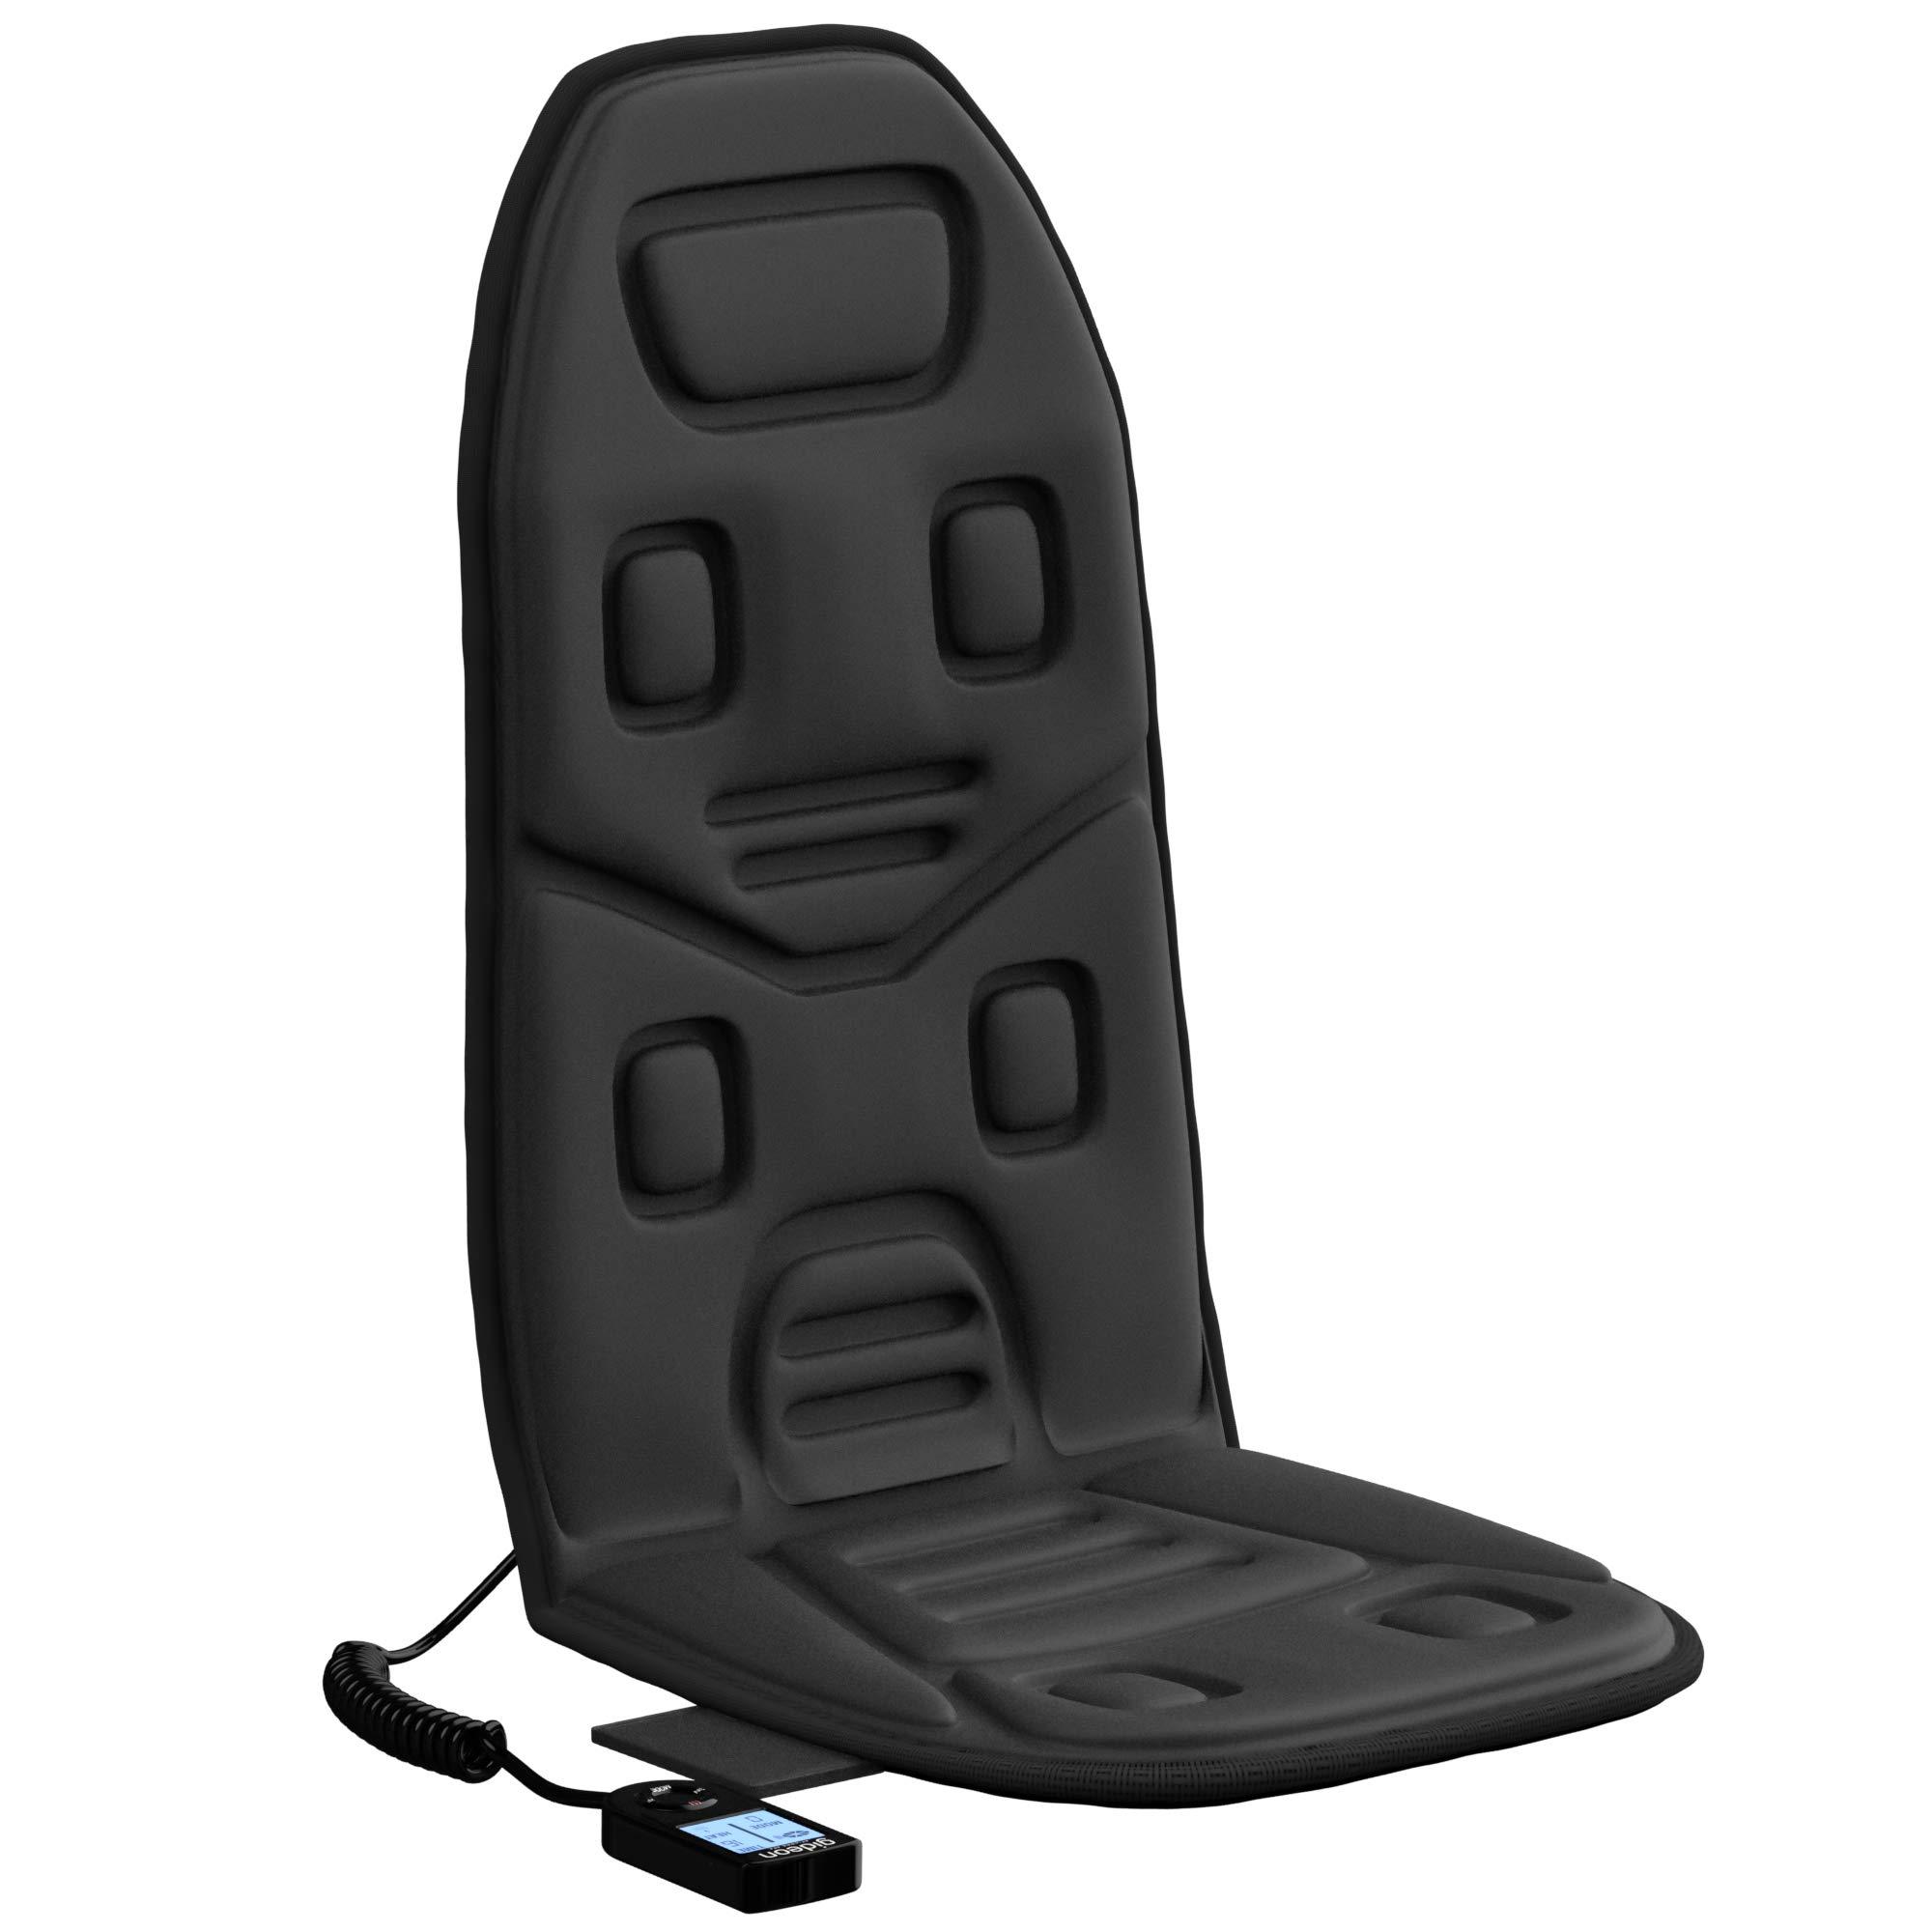 Gideon Heated Vibrating Seat Cushion